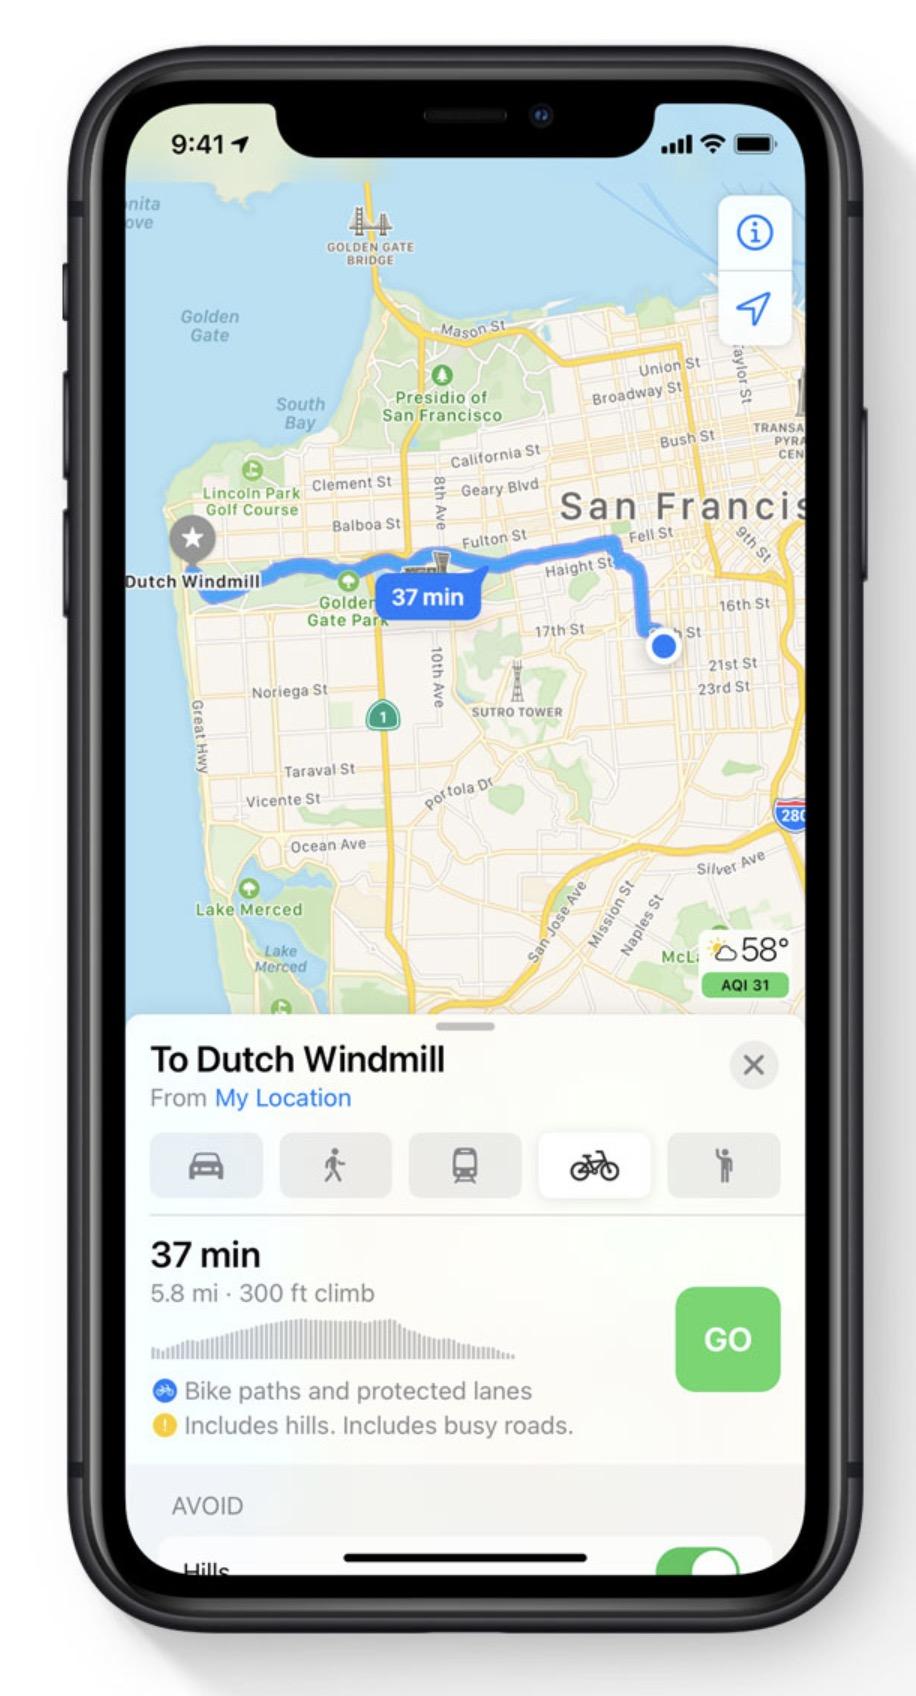 Apple iOS 14 - Maps - Cycling